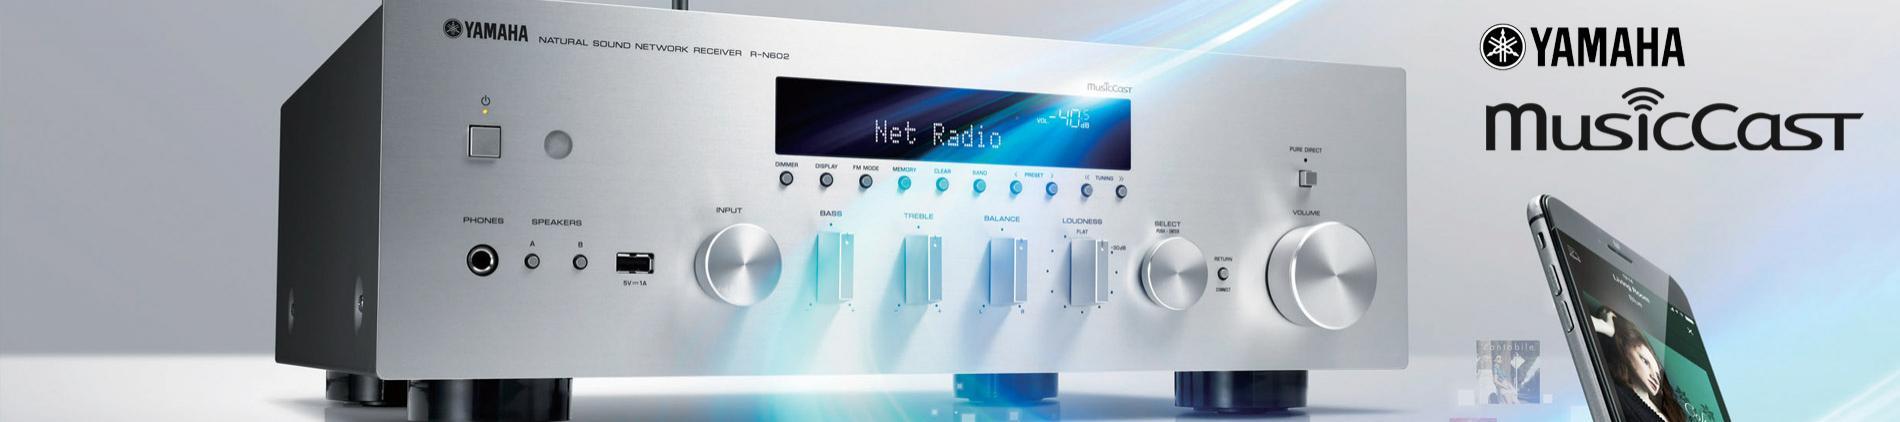 Yamaha.musiccast,music,streaming